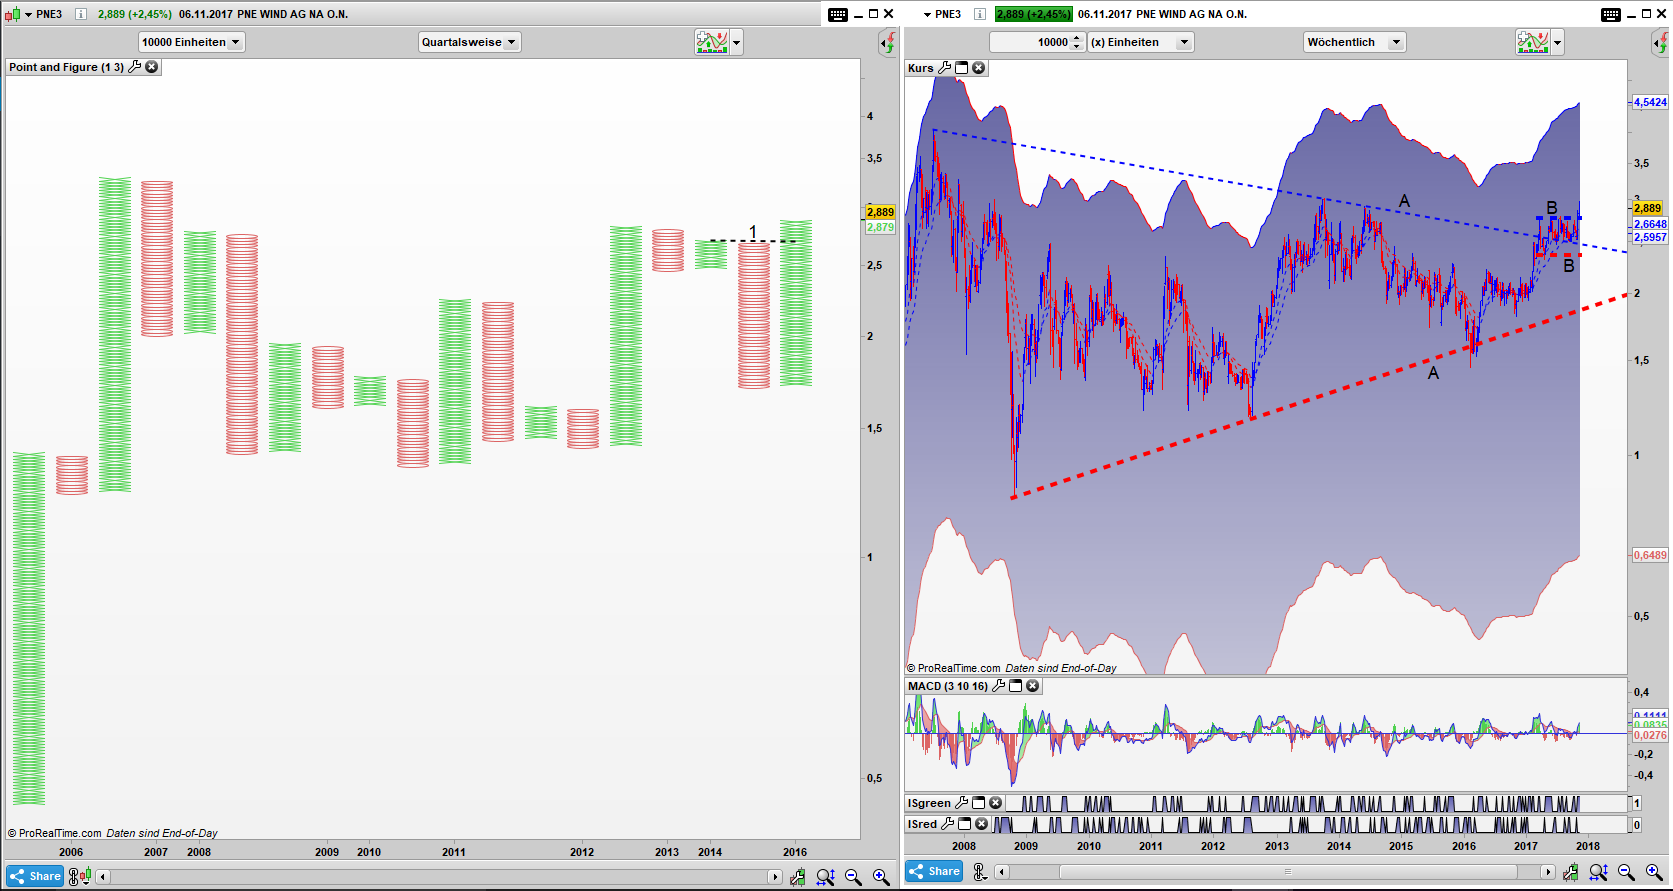 PNE3 Point and Figure Quartals Chart, Bar Monats Chart: Simple Buy Signal aktiv, Ausbruch aus dem x BNR Pattern